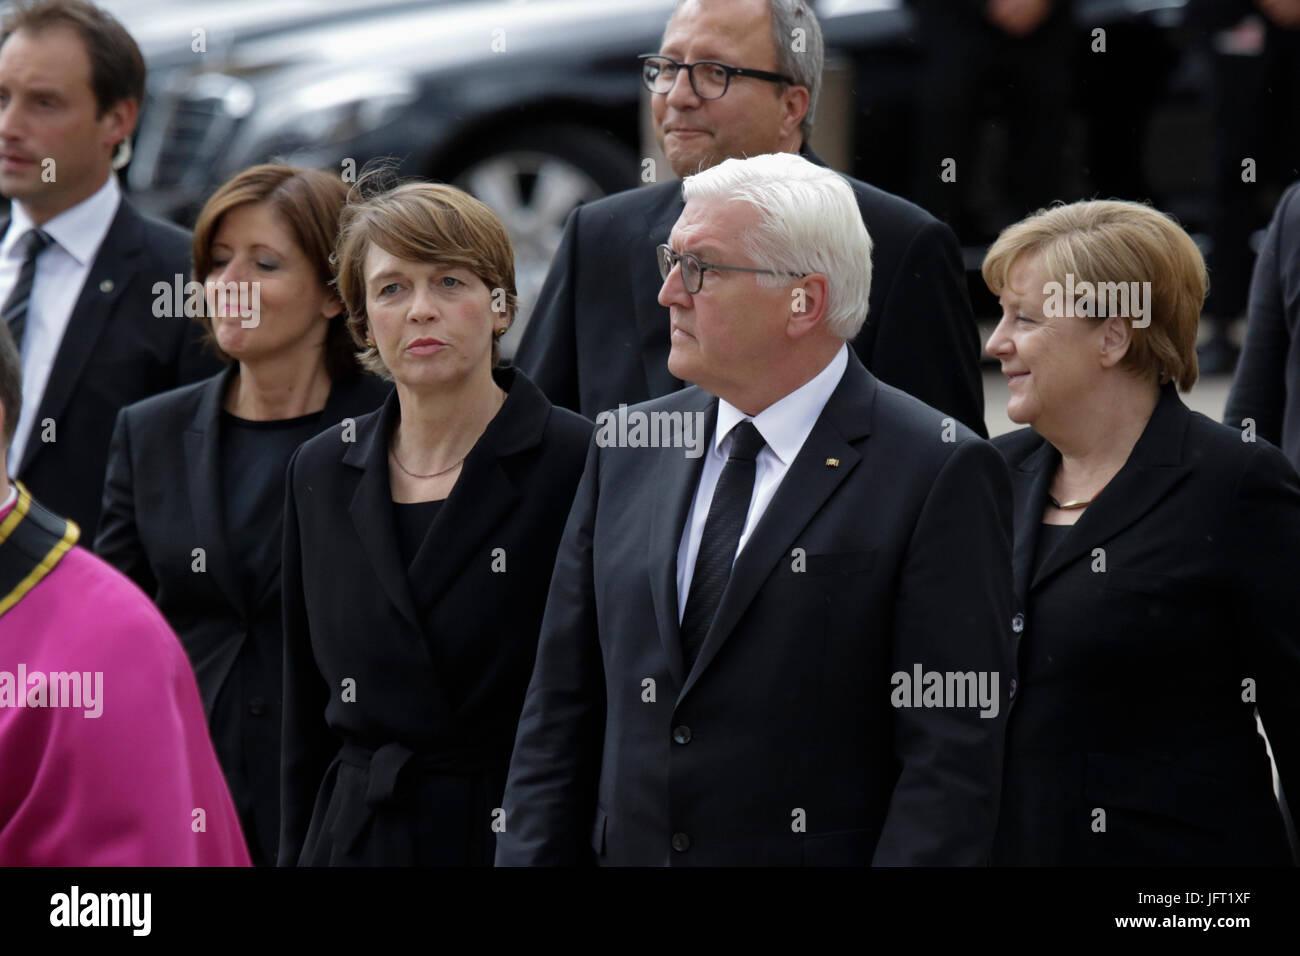 Speyer, Germany. 01st July, 2017. Frank-Walter Steinmeier (centre), the President of Germany, his wife Elke Budenbender - Stock Image